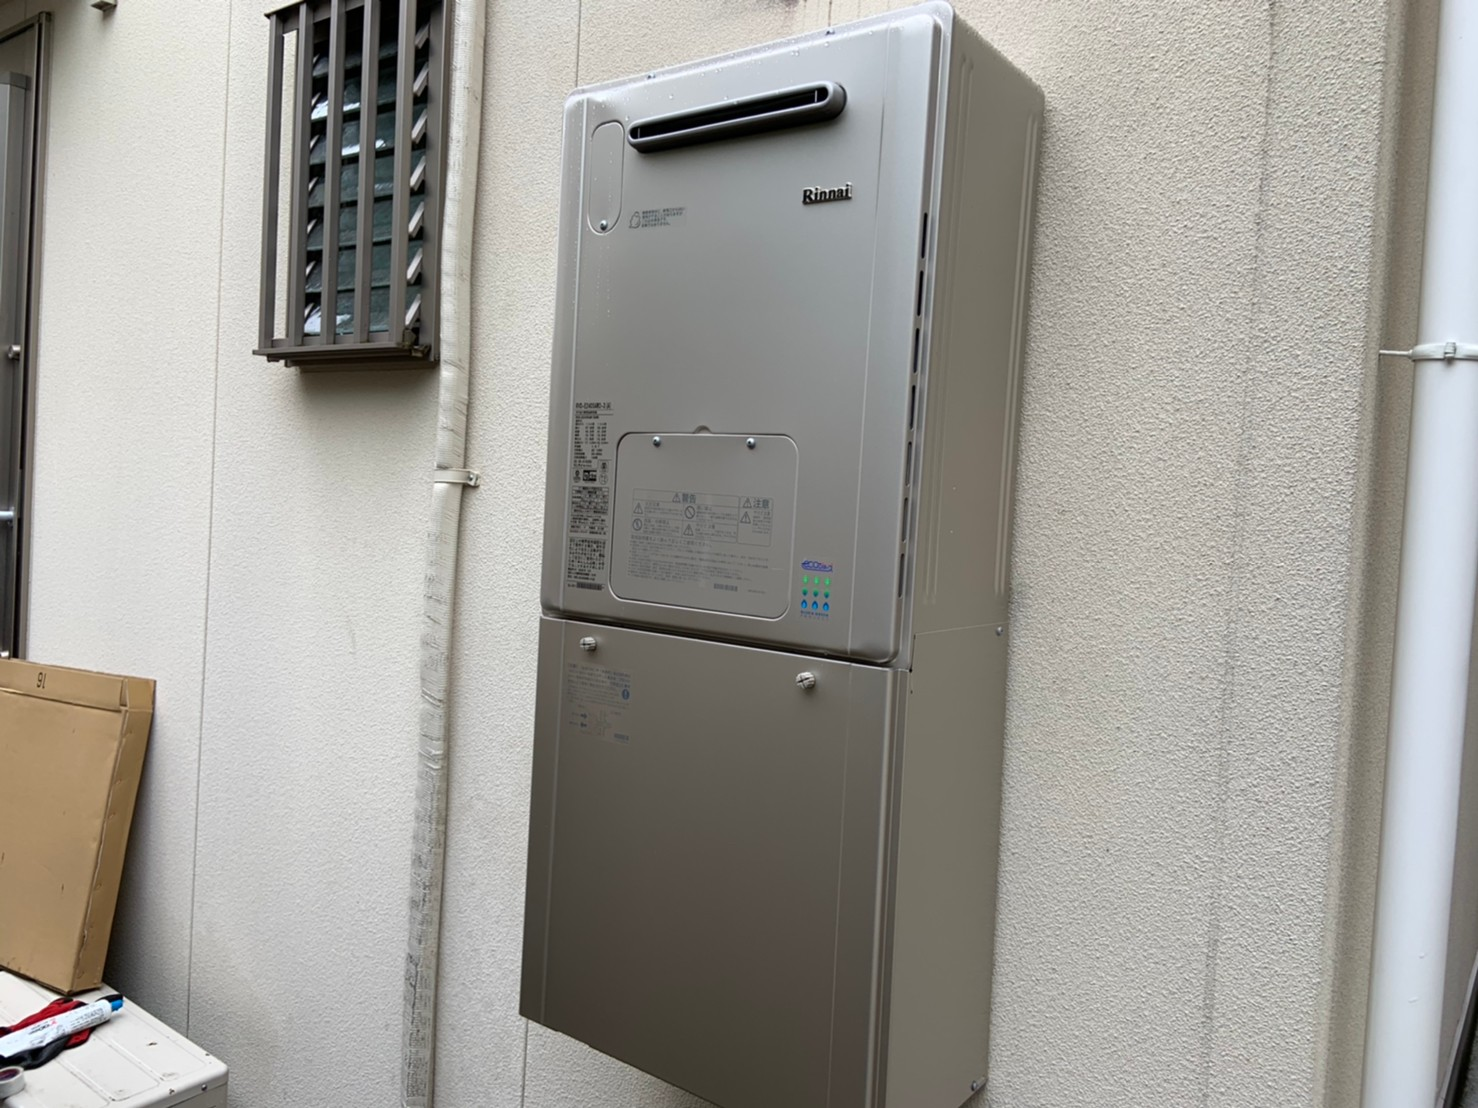 ガス給湯暖房用熱源機の交換|RVD-E2405AW2-3|京都市北区上賀茂